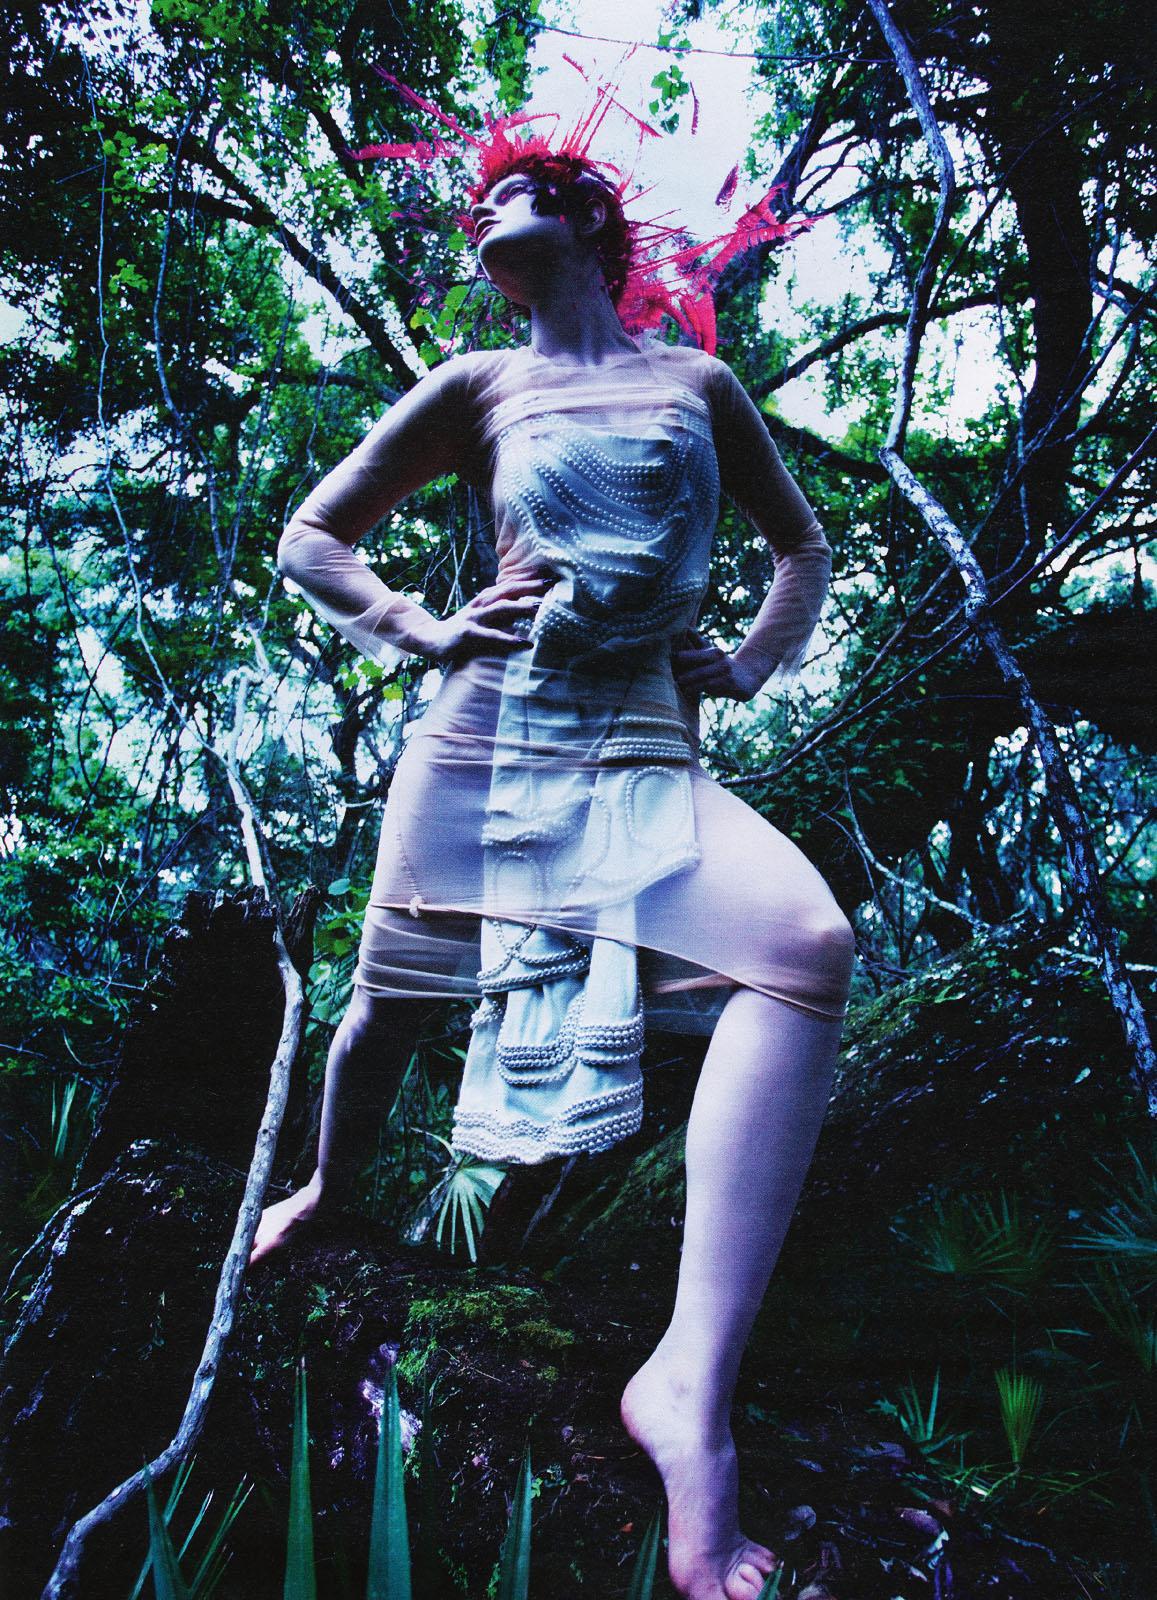 эротика фотомодель фотографы модели мода fashion story fashion  Лесные симфонии Марио Сорренти для журнала W, август 2009